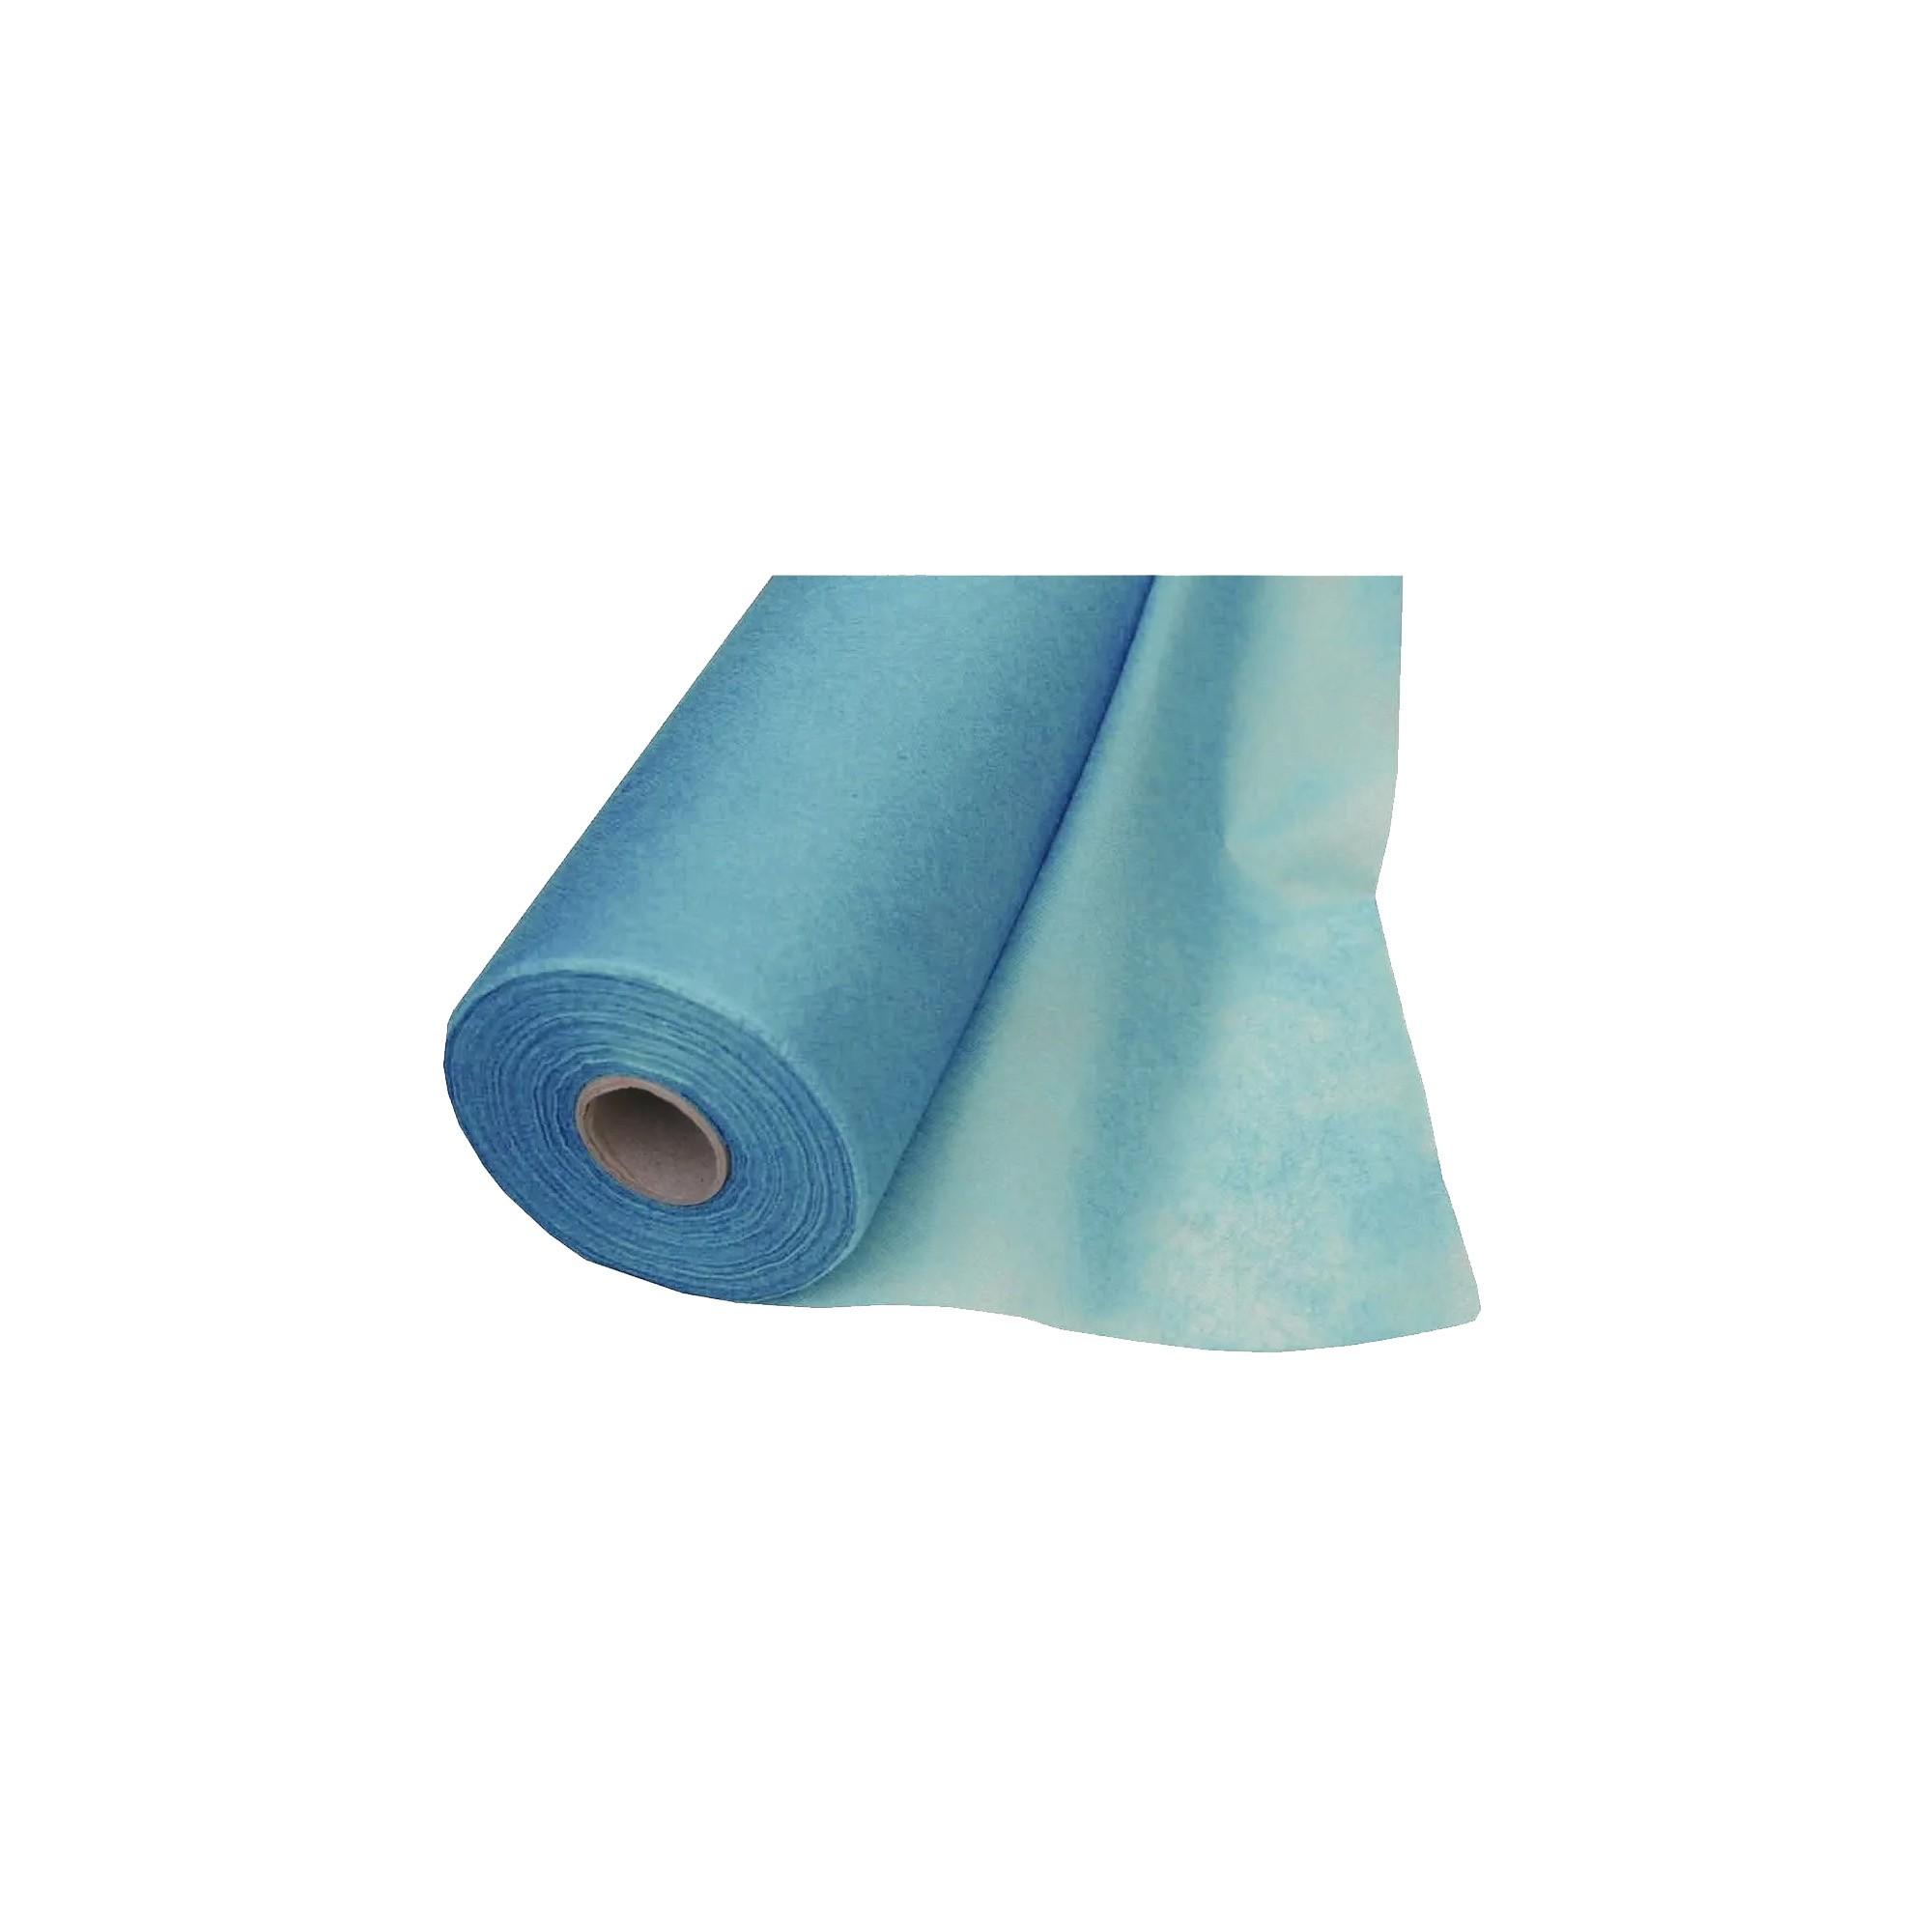 TNT LISO 10M - Azul Claro